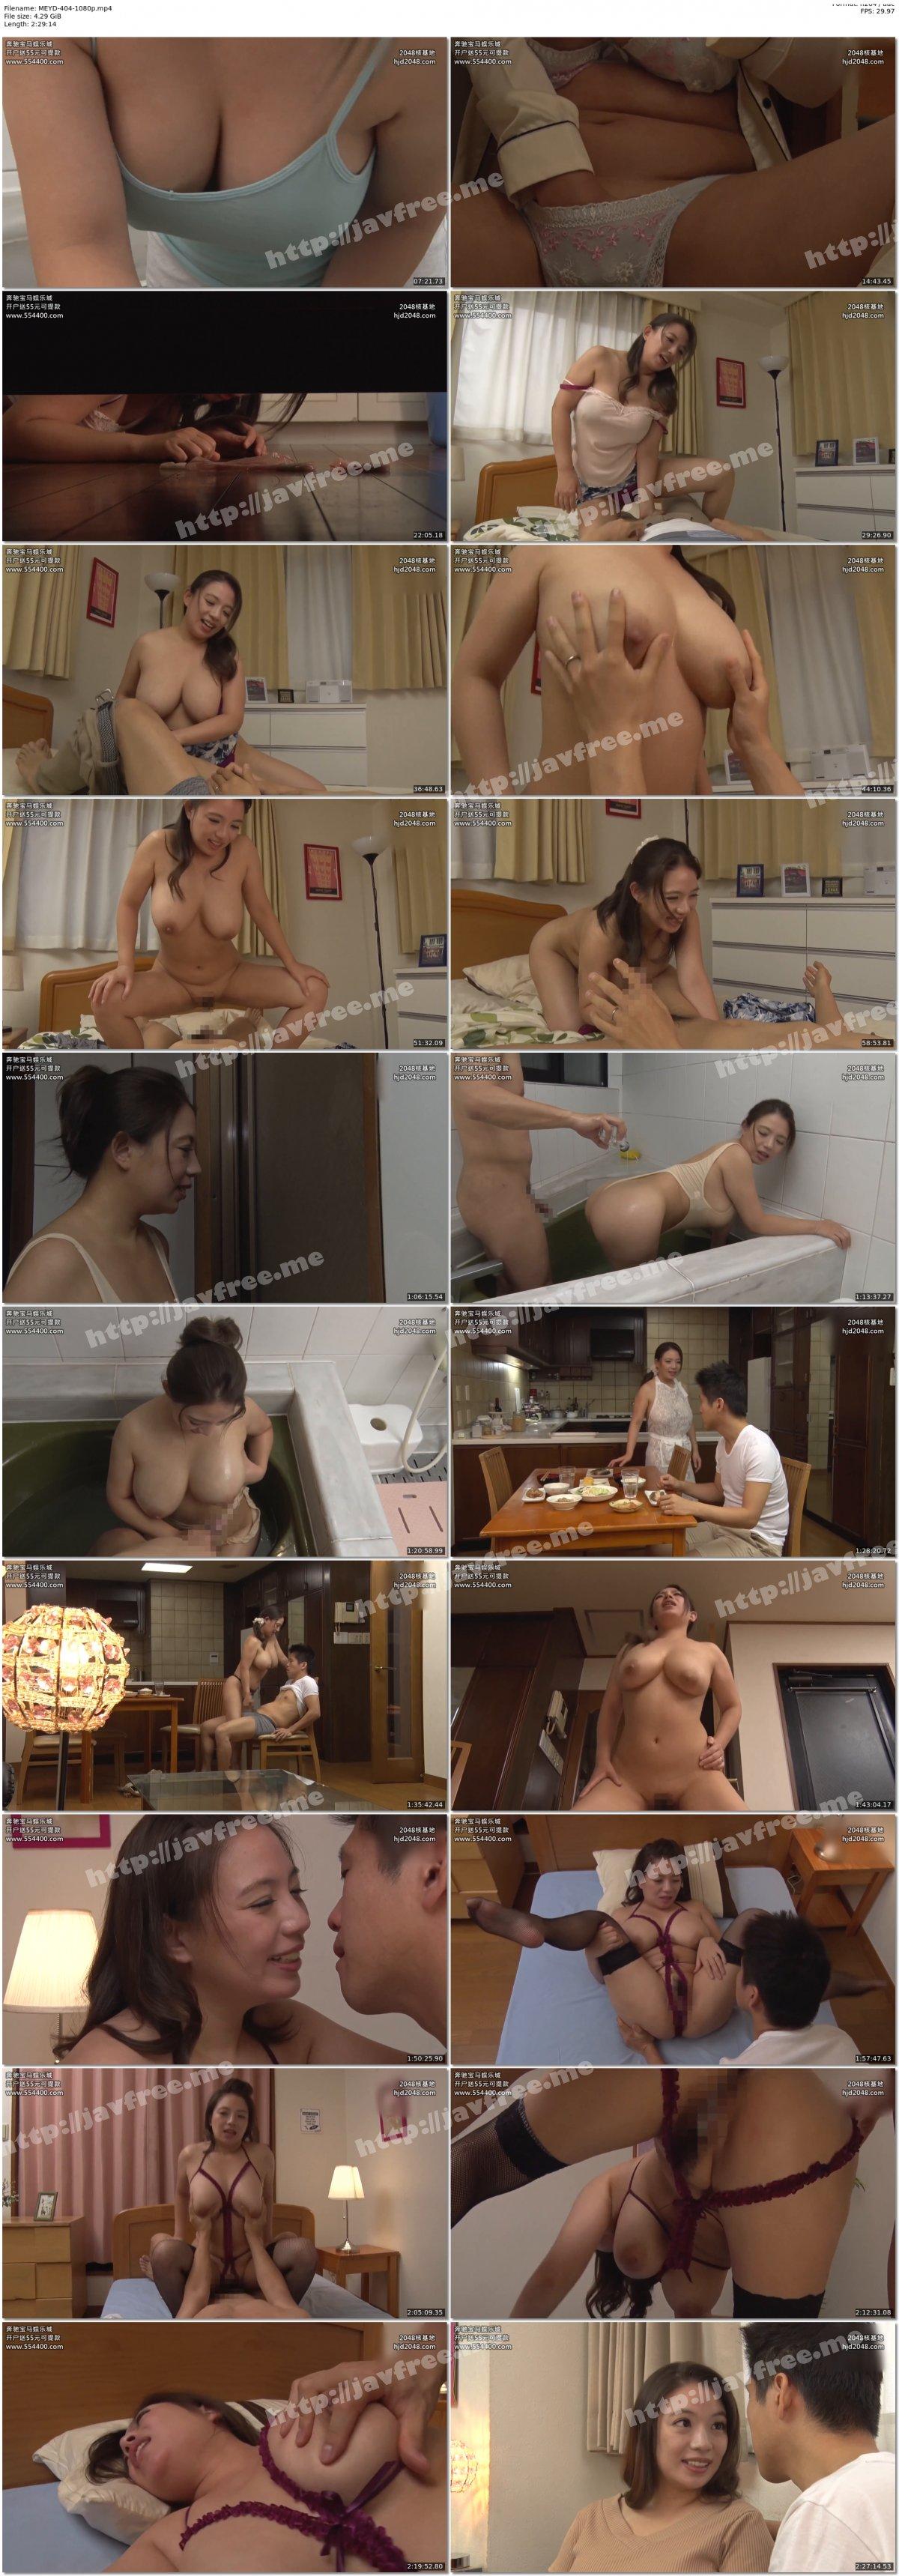 [HD][MEYD-404] 今日は孕むまでナカに出して… 織田真子 - image MEYD-404-1080p on https://javfree.me